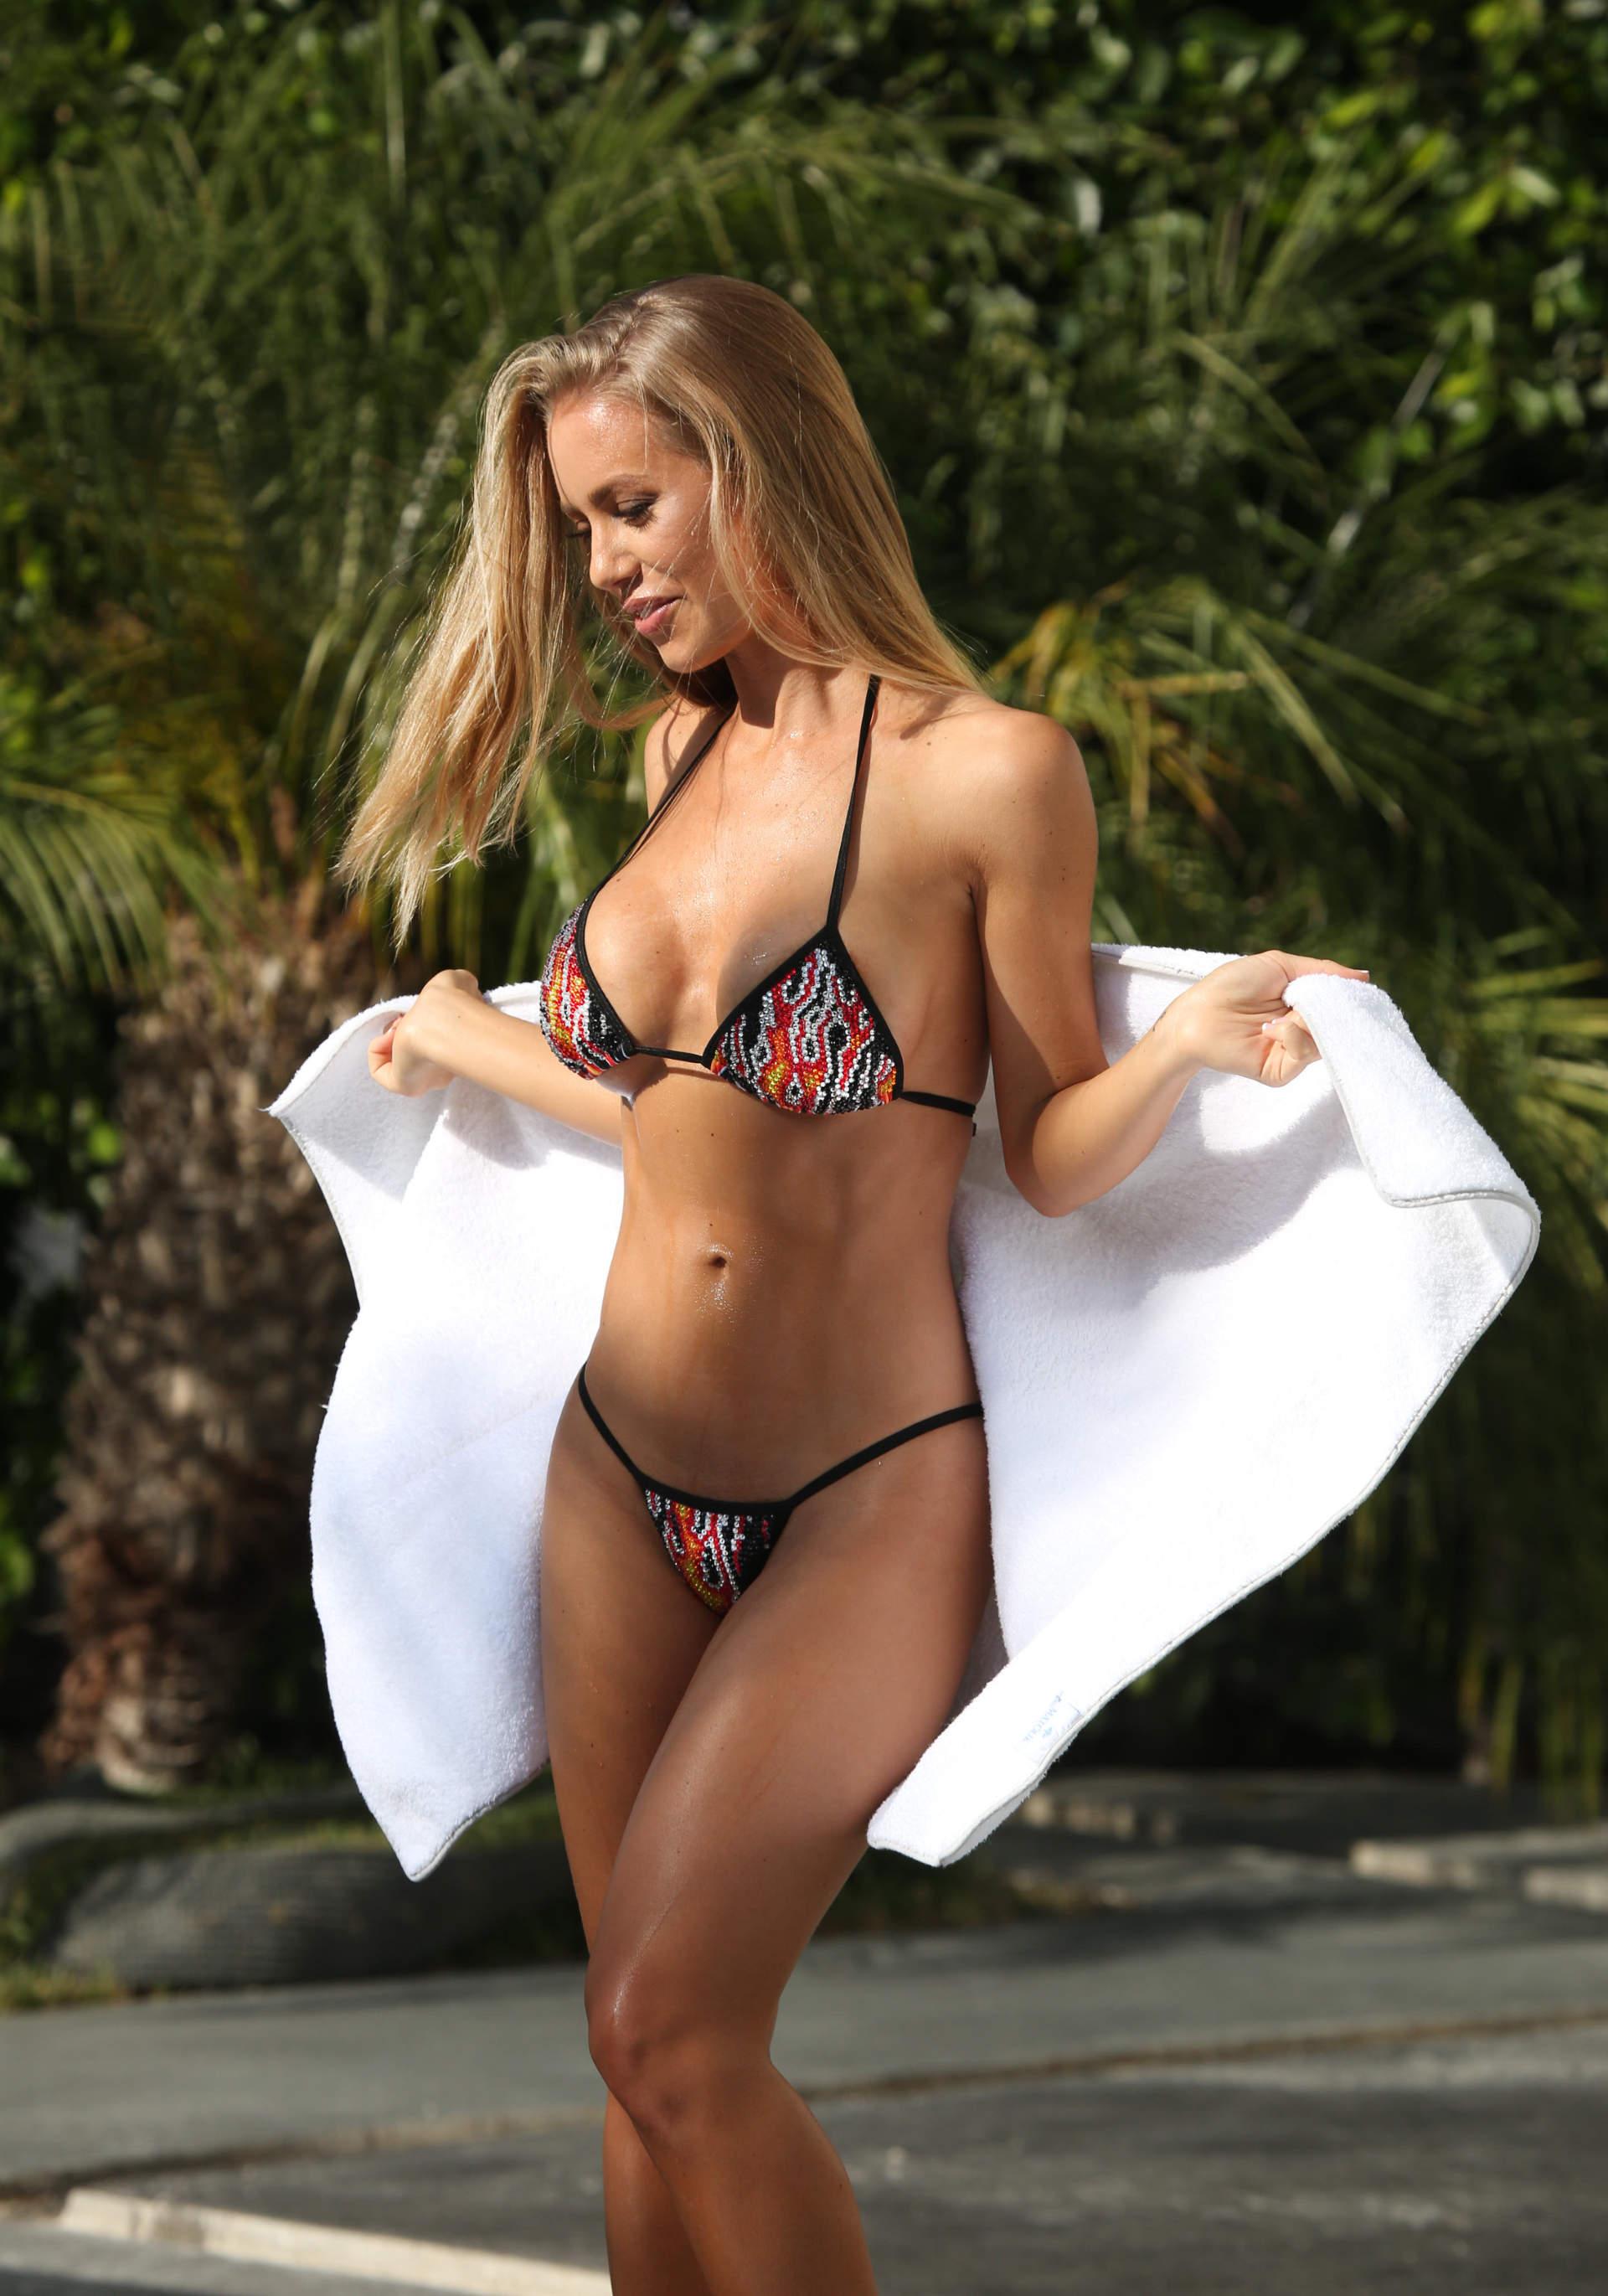 Nicole aniston vk